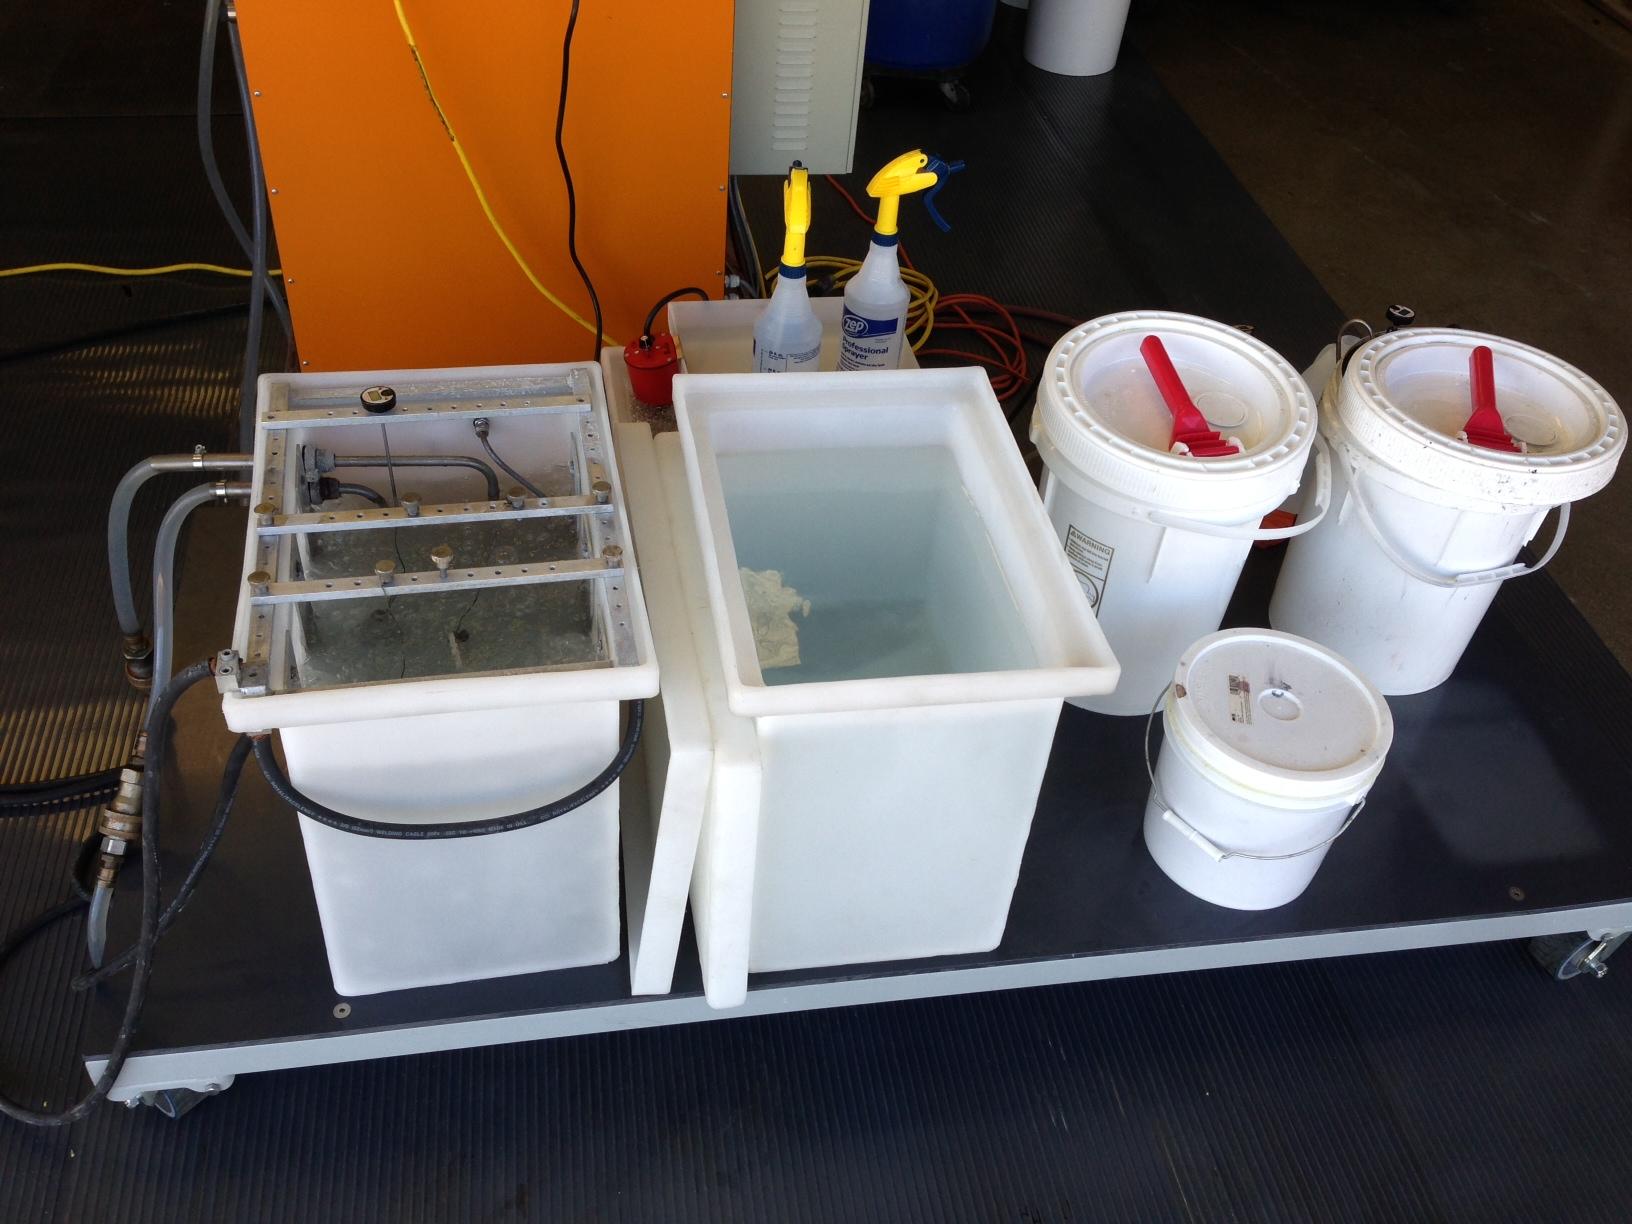 Diy anodizing kit uk clublifeglobal diy anodizing kit clublilobal com solutioingenieria Images